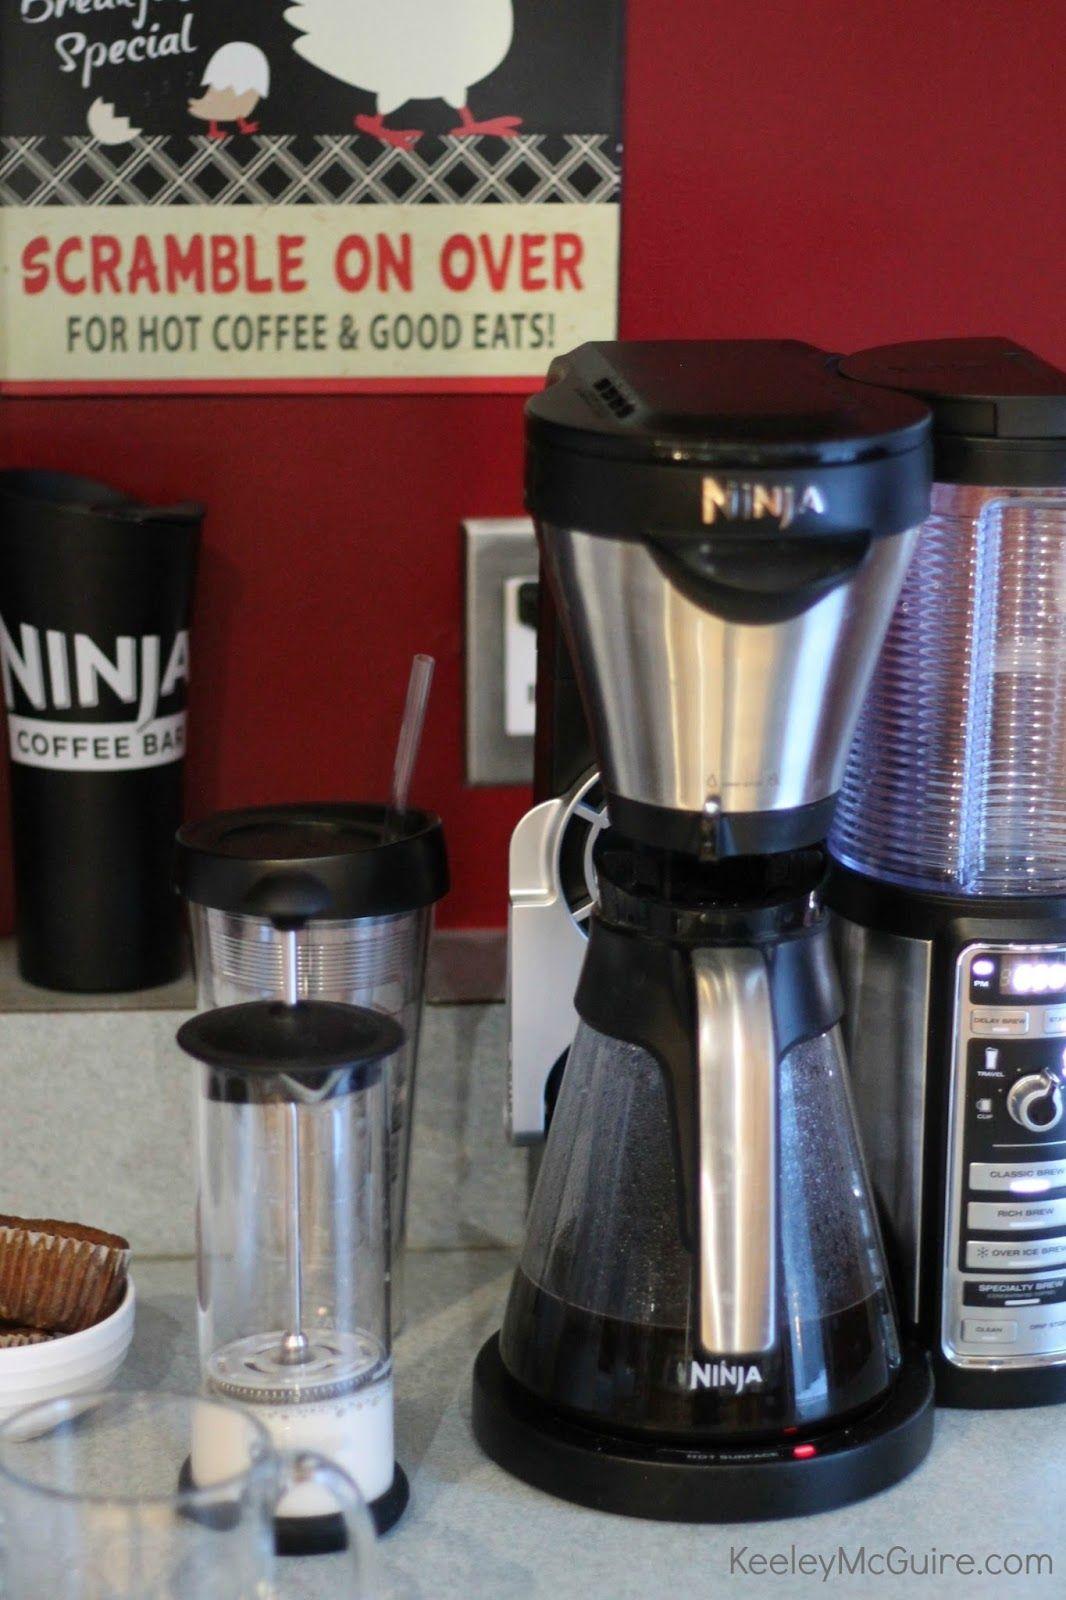 Gluten free allergy friendly ninja coffee bar at home